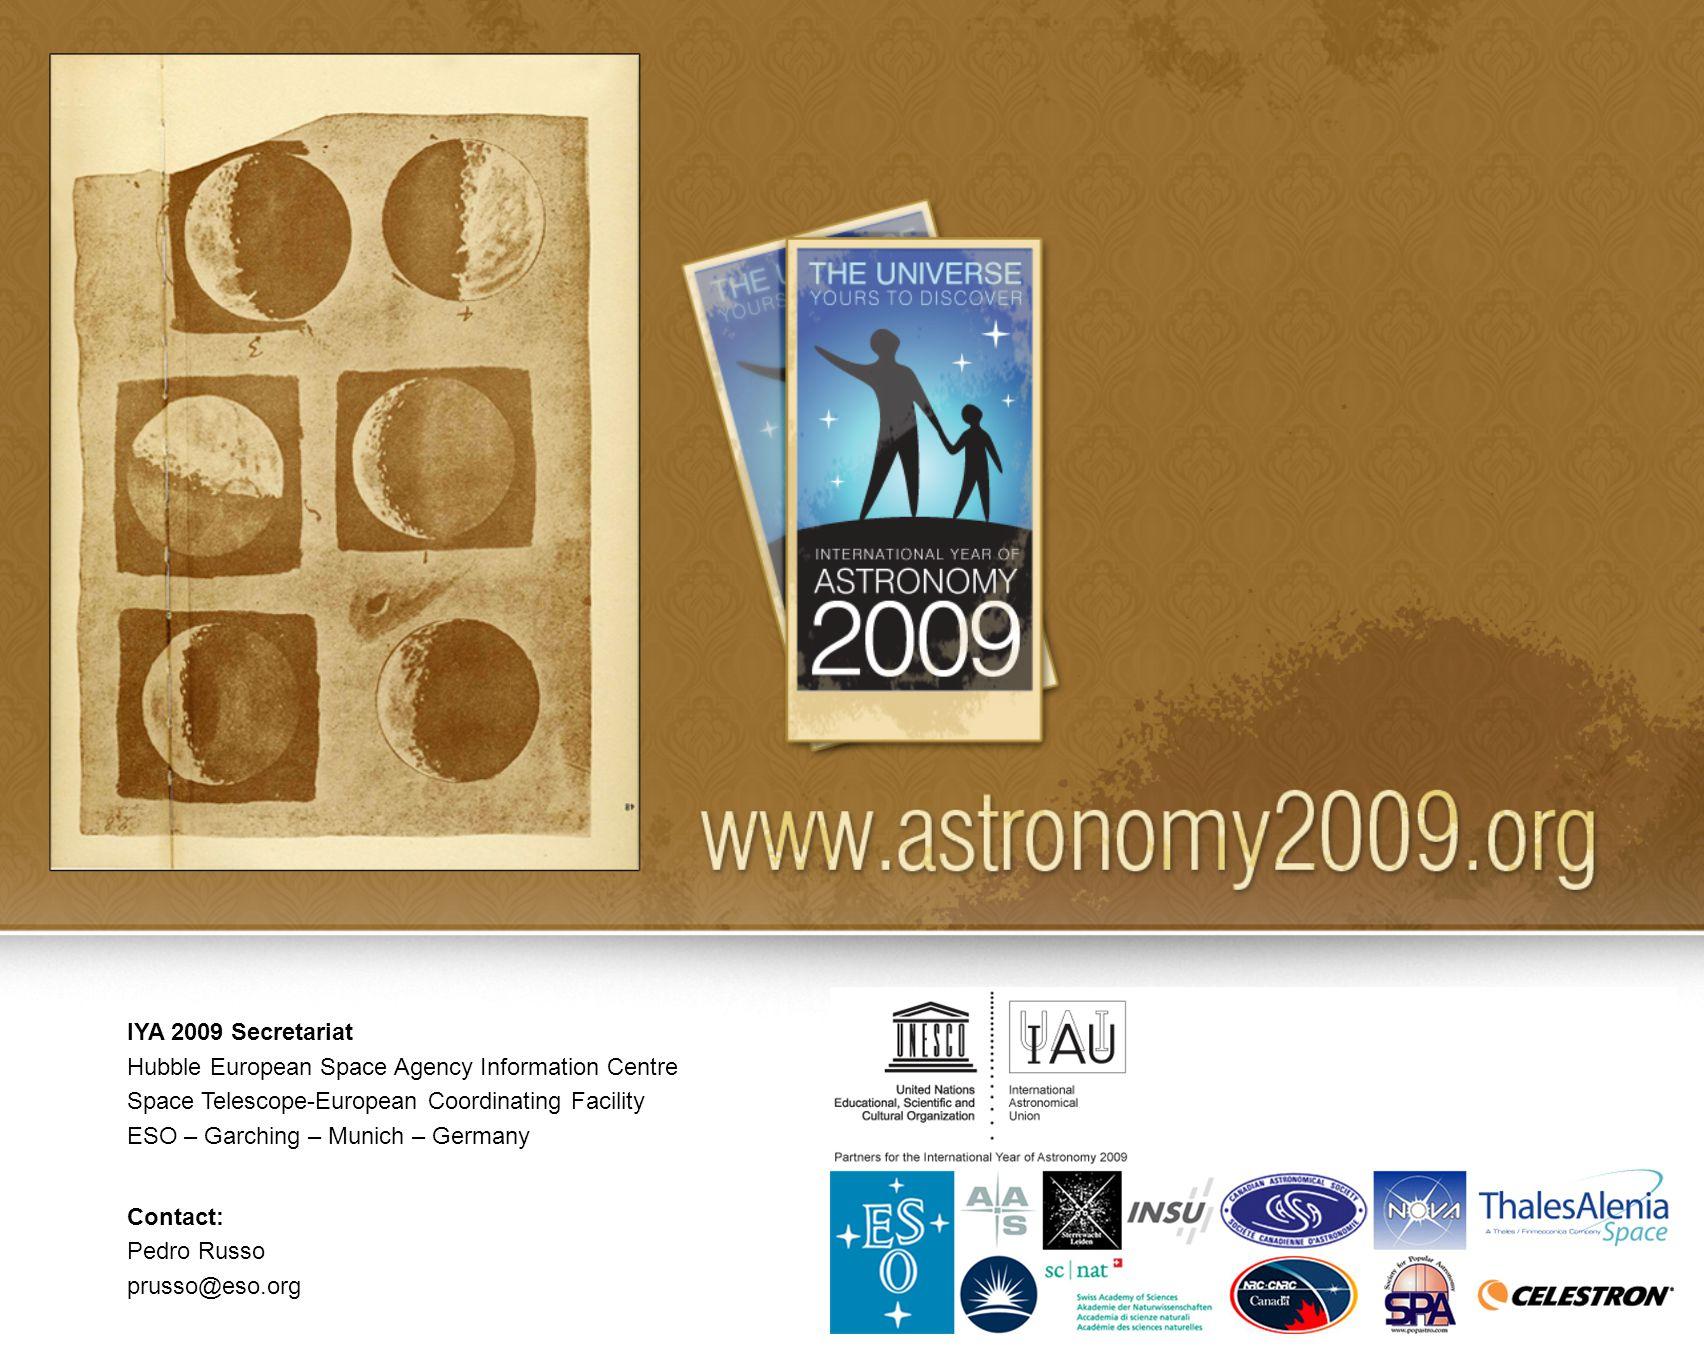 IYA 2009 Secretariat Hubble European Space Agency Information Centre Space Telescope-European Coordinating Facility ESO – Garching – Munich – Germany